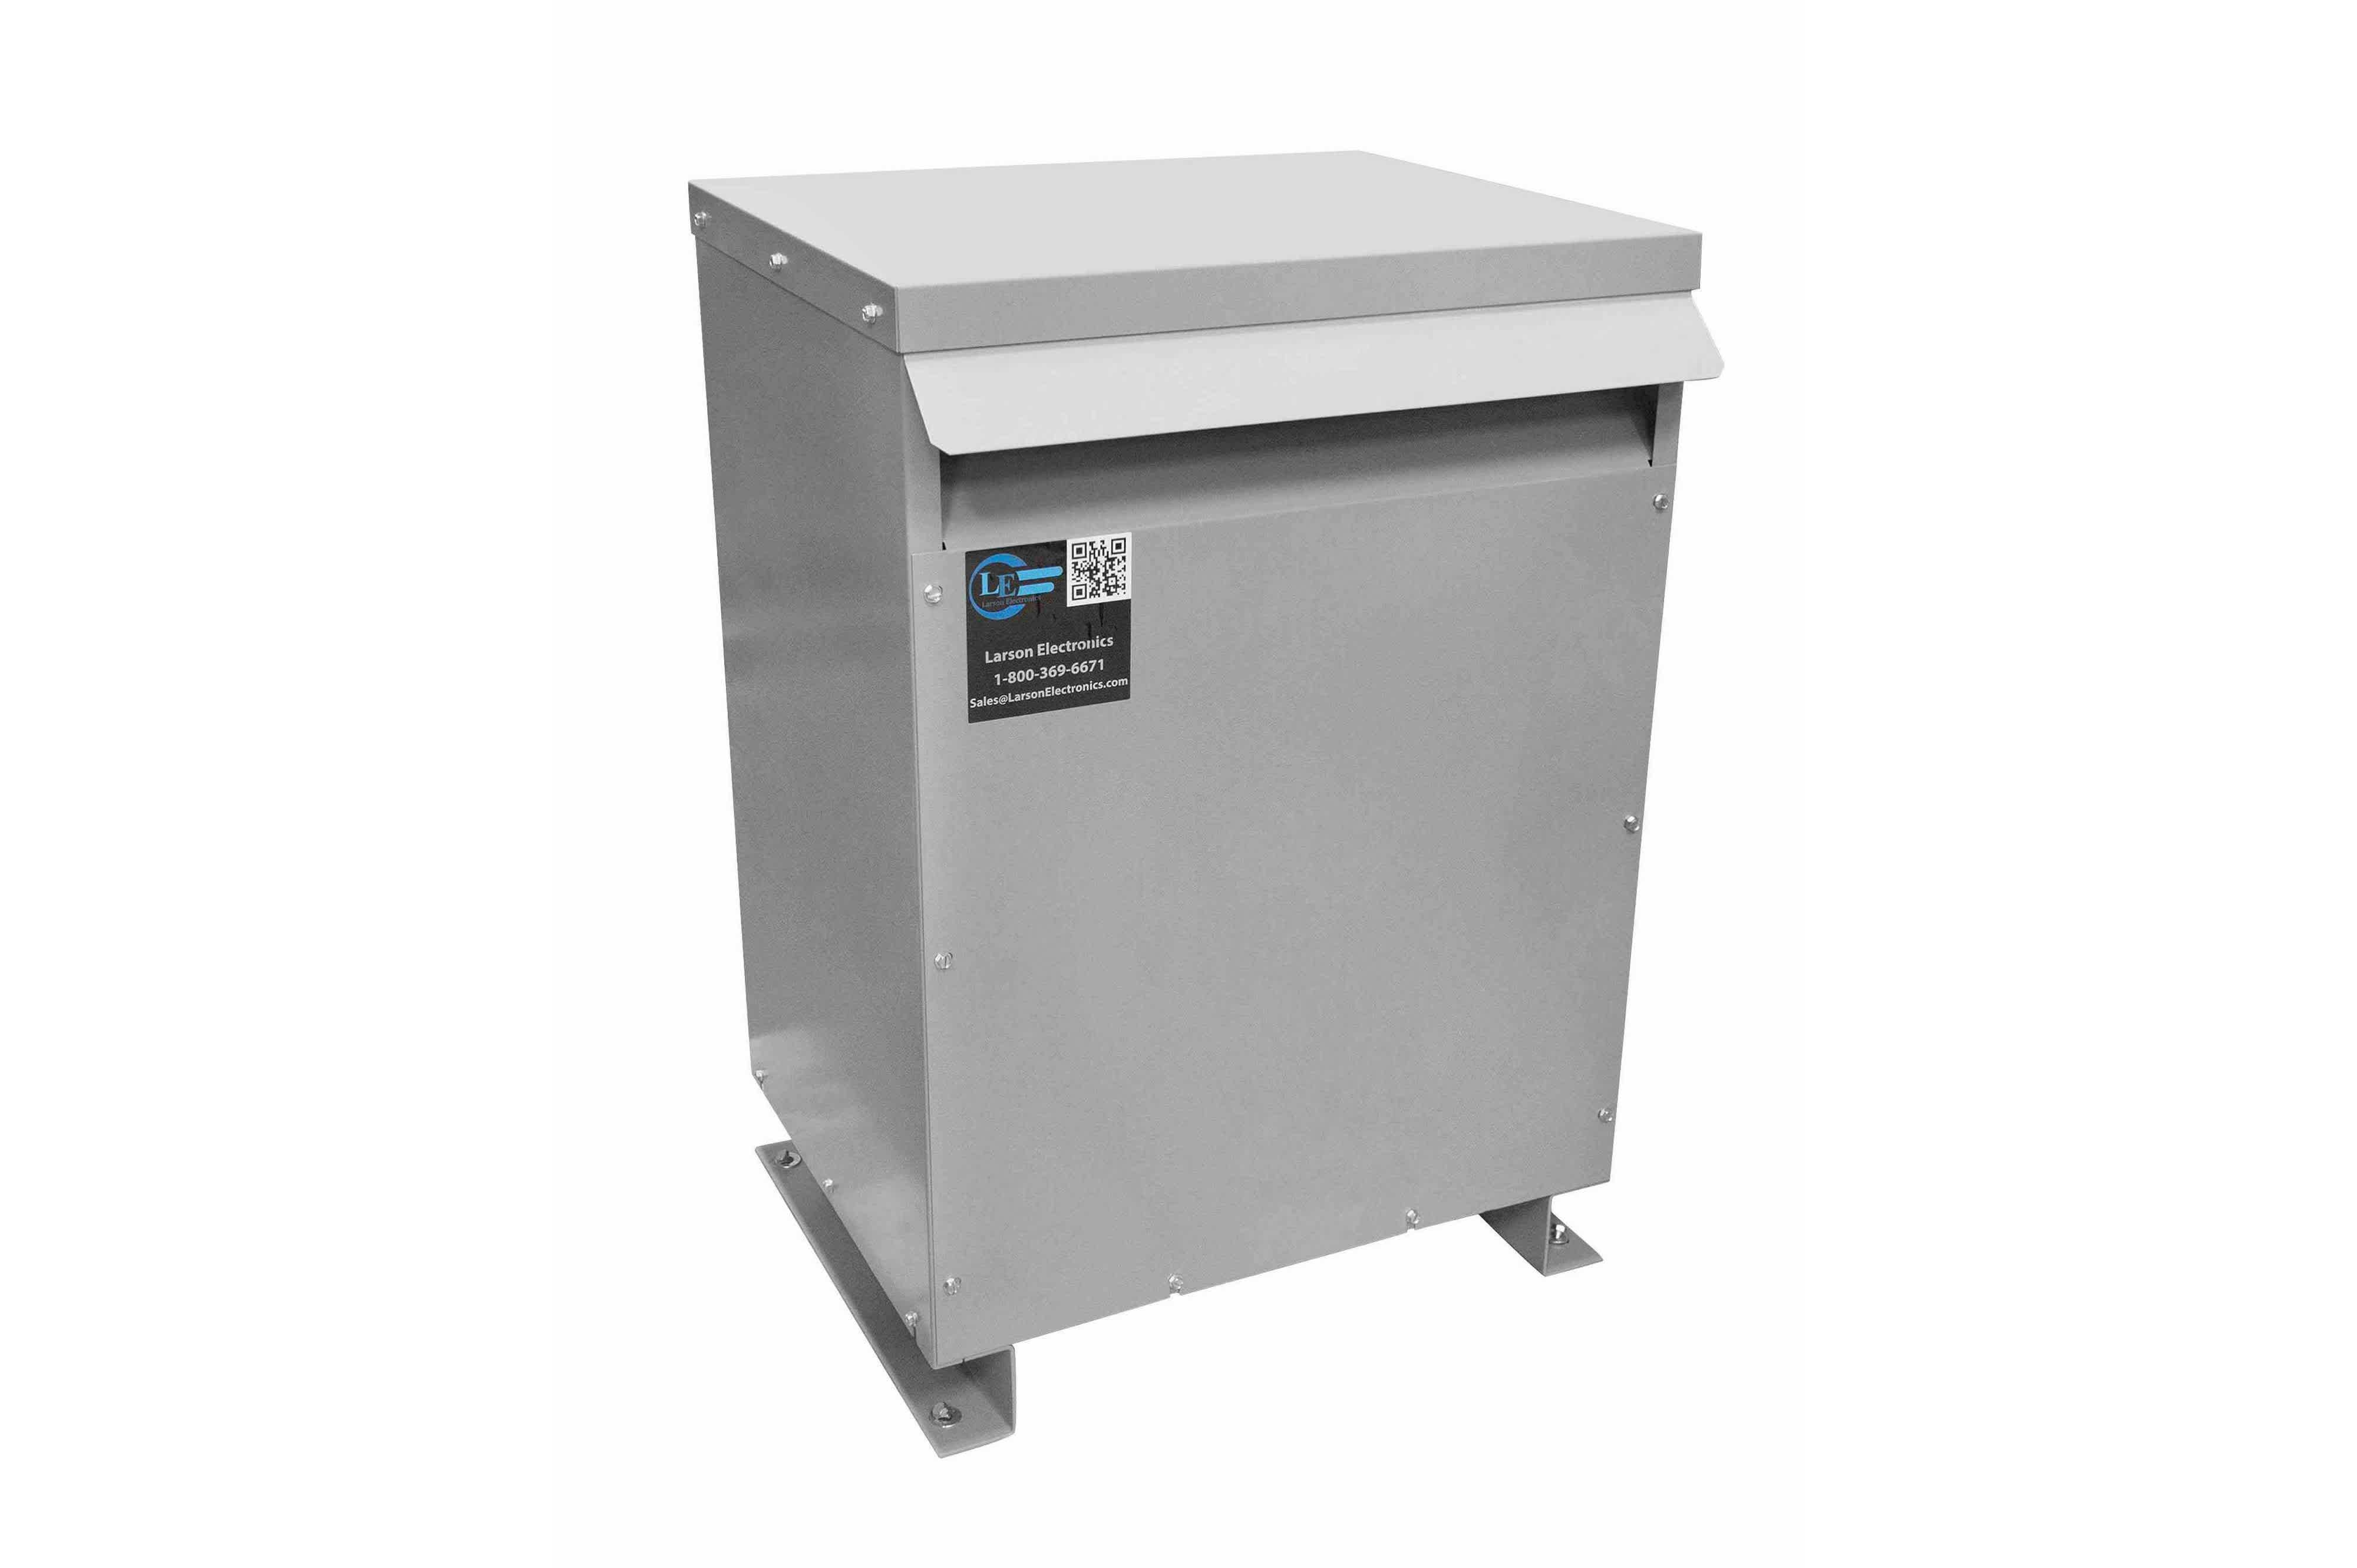 275 kVA 3PH Isolation Transformer, 575V Wye Primary, 208Y/120 Wye-N Secondary, N3R, Ventilated, 60 Hz